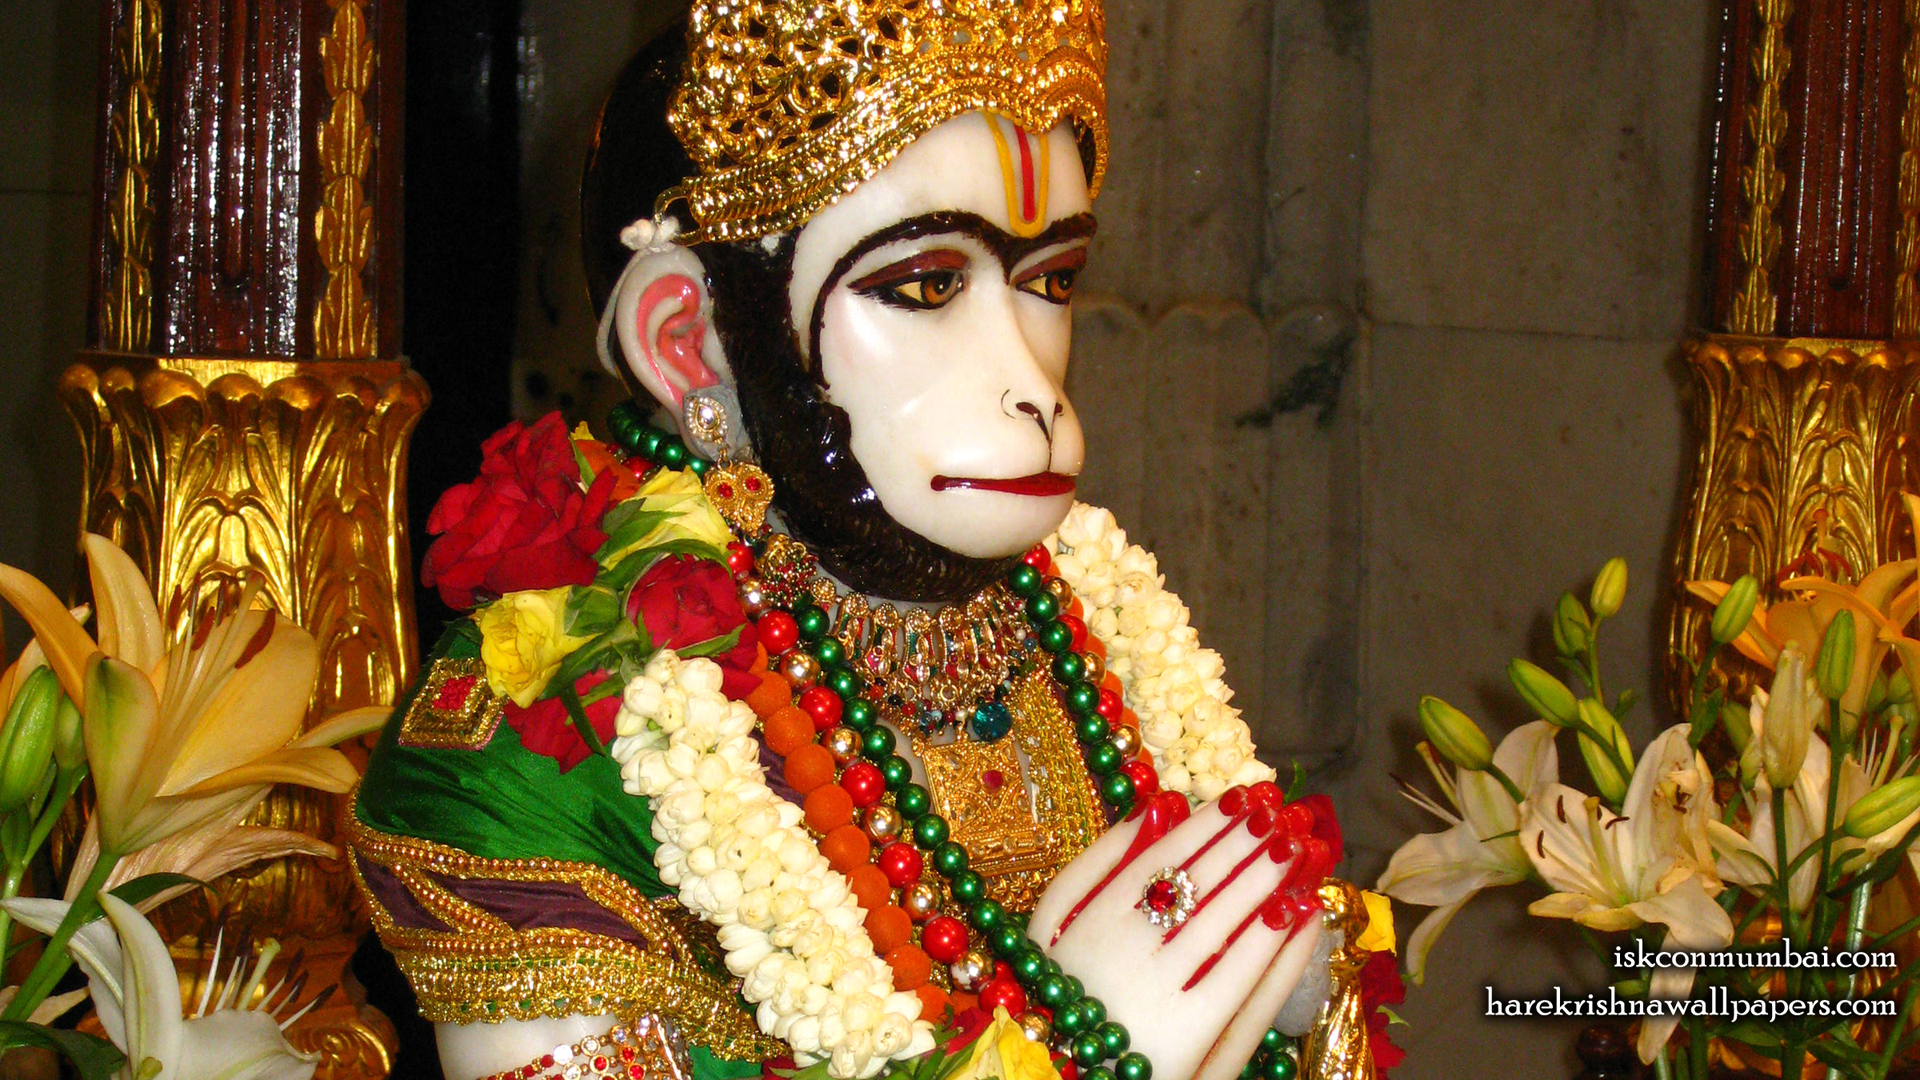 Sri Hanuman Face Wallpaper (008) Size 1920x1080 Download